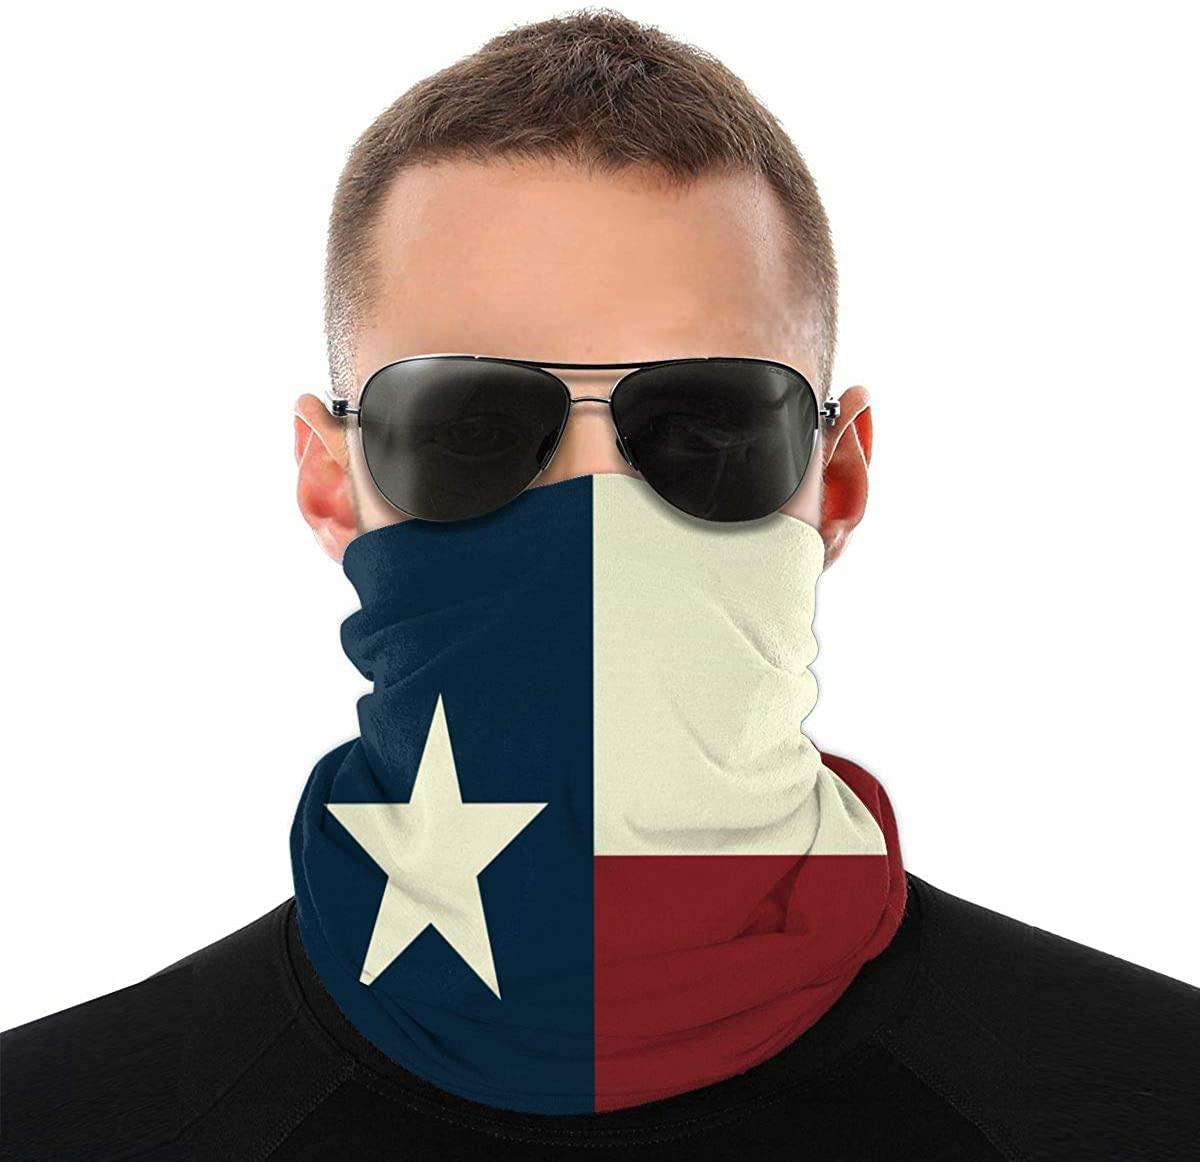 The USA America States Flag Unisex Bandana Seamless Scarf Headband Outdoor Sweatband Headwear